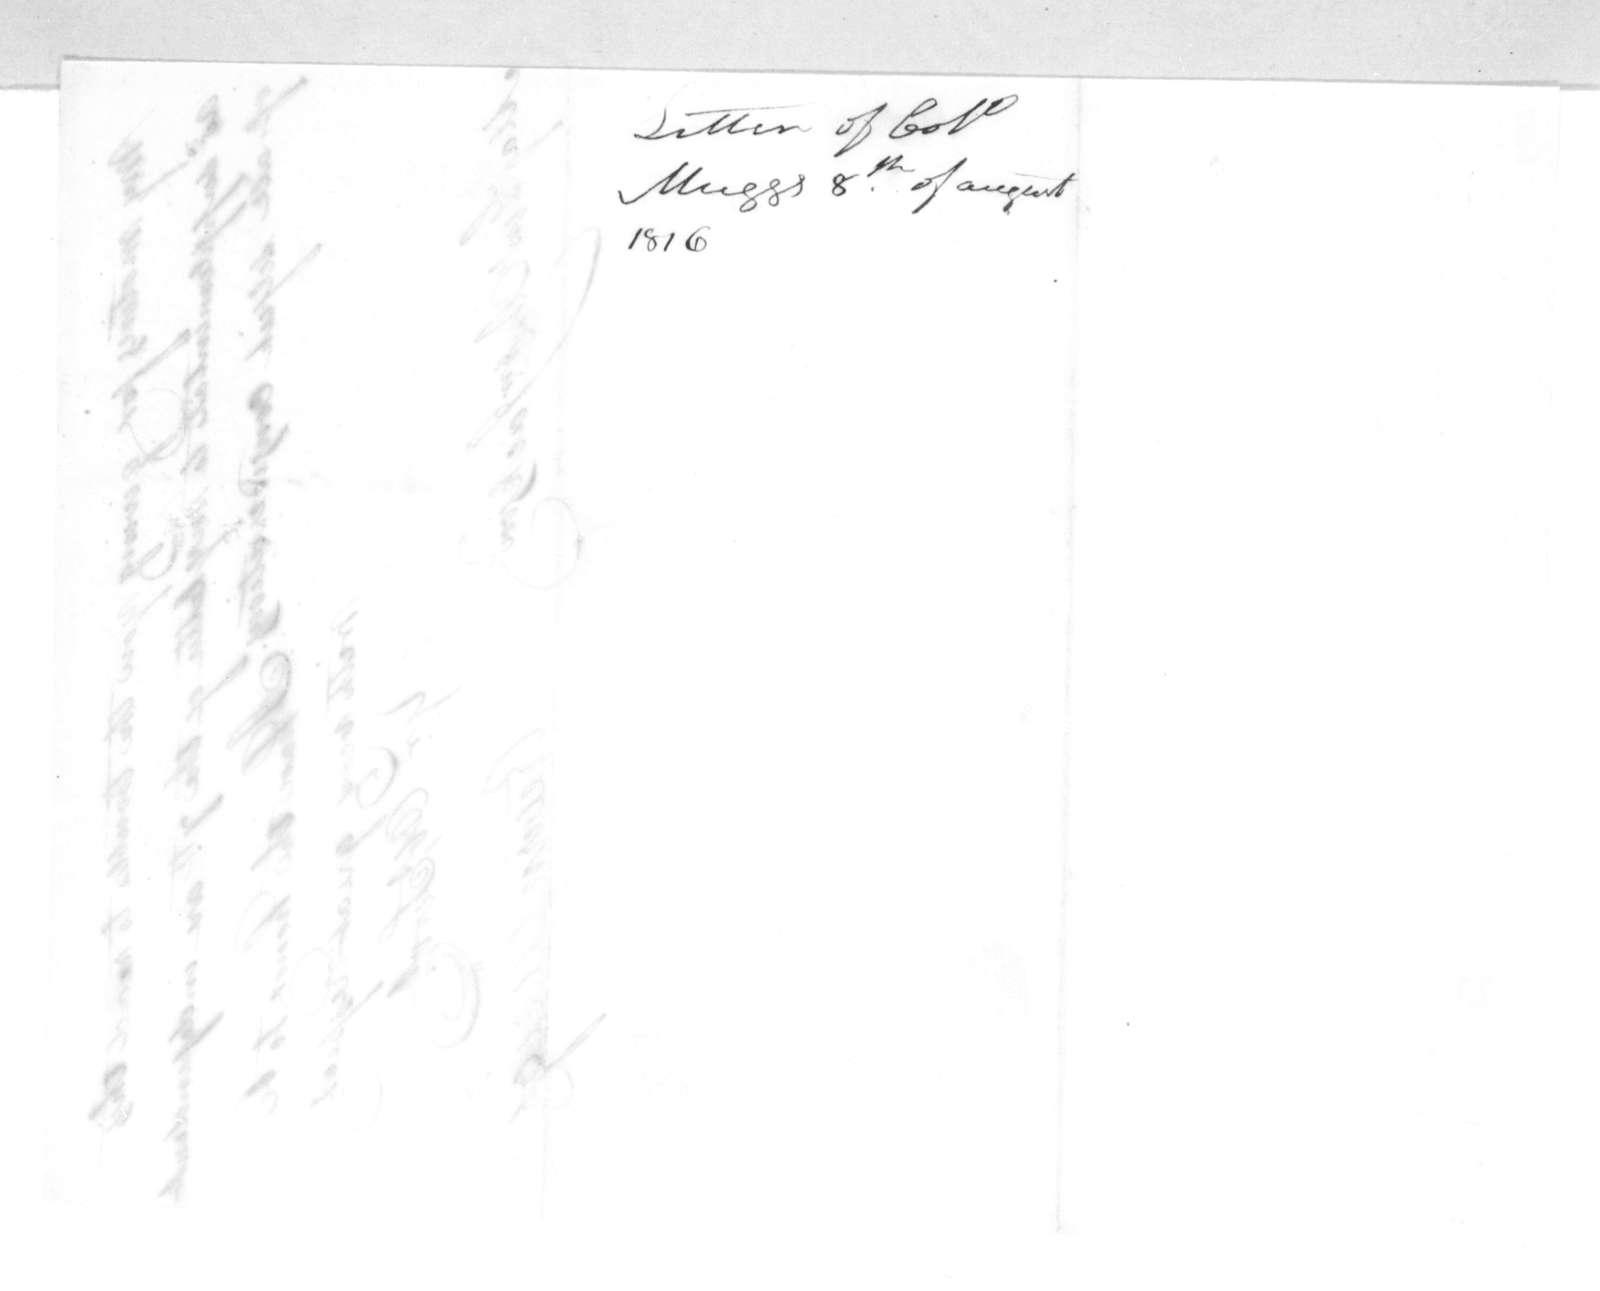 Return Jonathan Meigs to Andrew Jackson, August 8, 1816